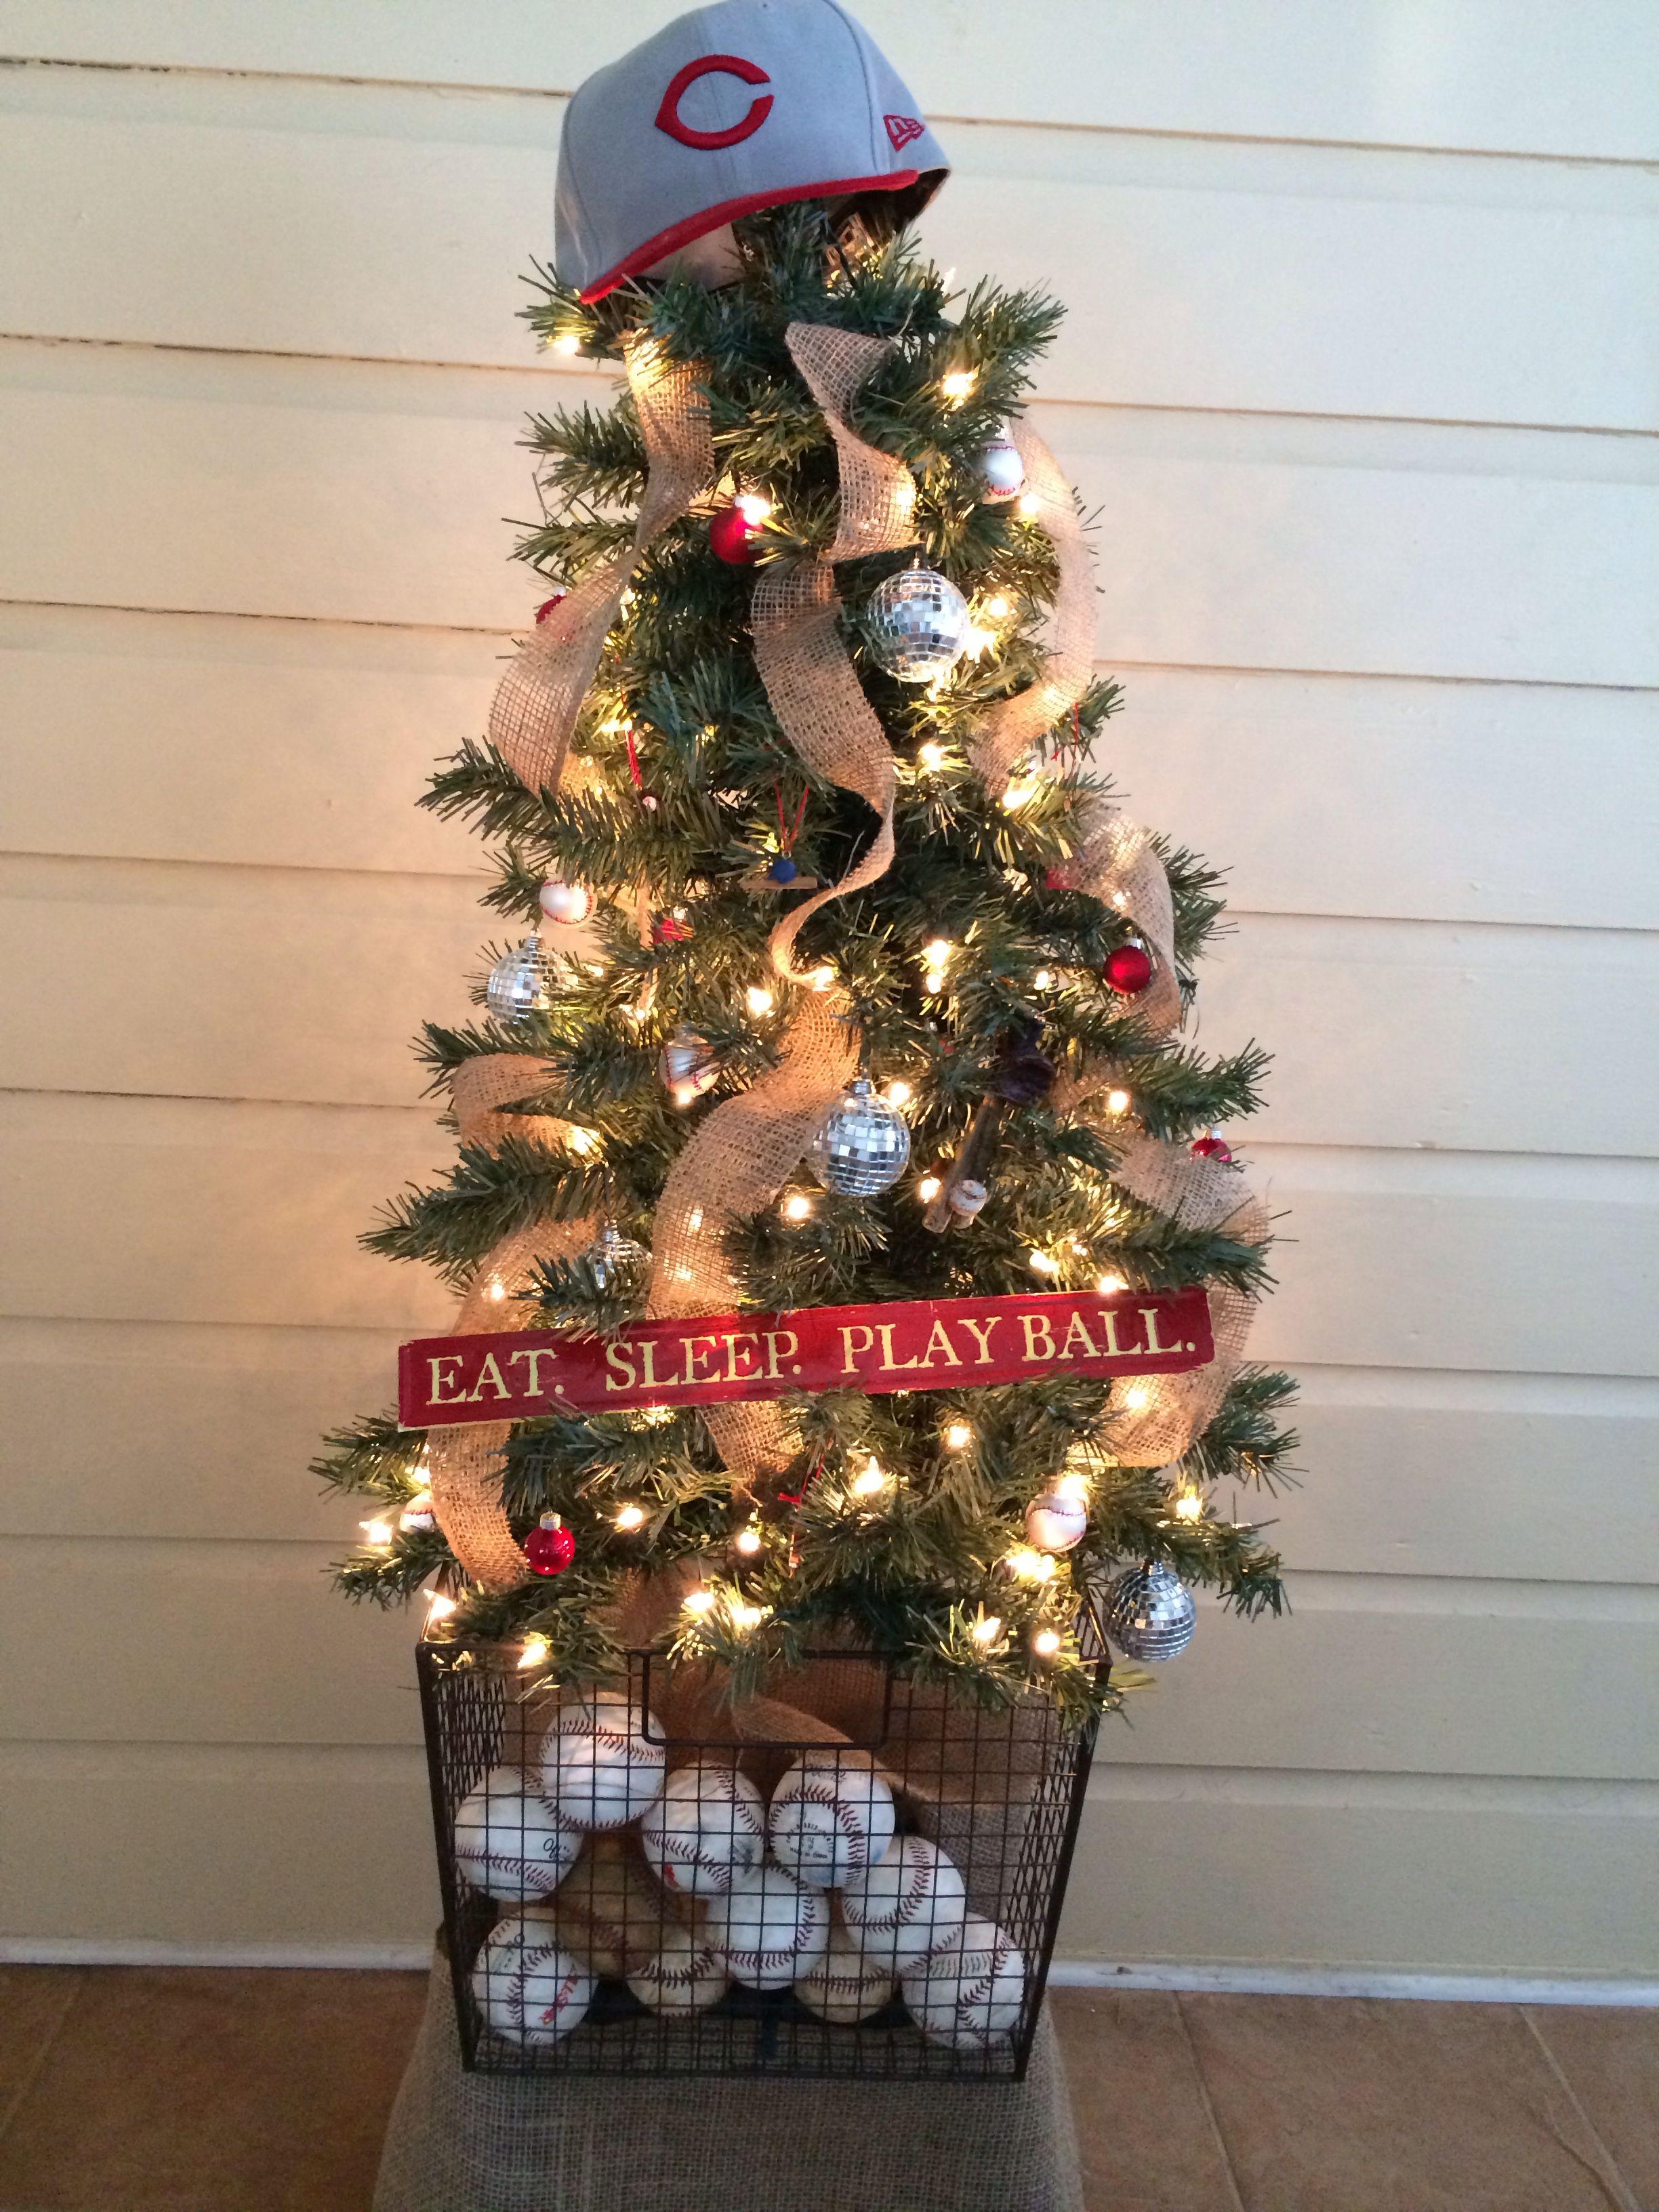 Baseball Christmas tree WISH I KNEW ABOUT